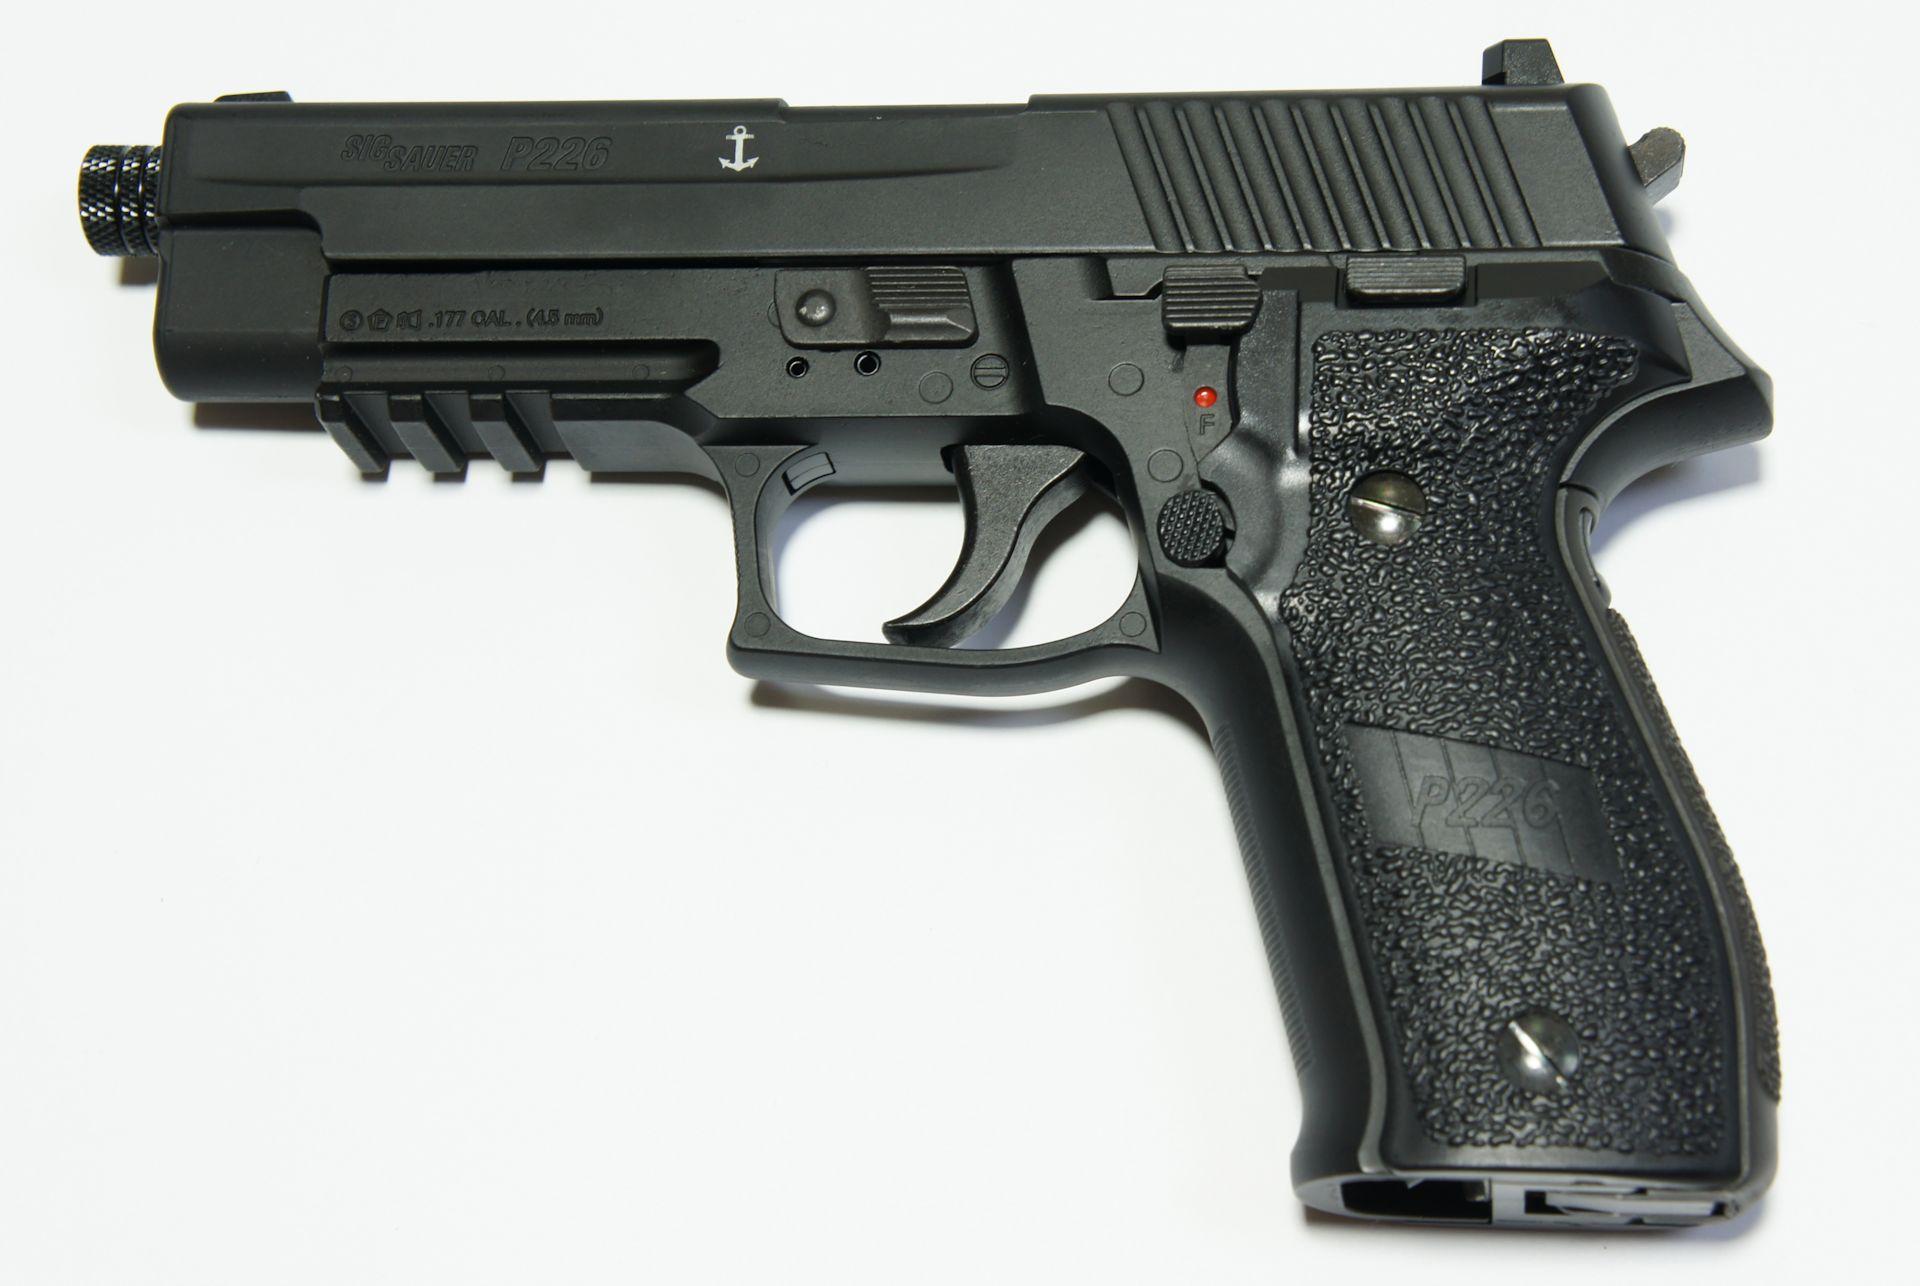 SIG P226 CO2-Pistole - 4,5 mm